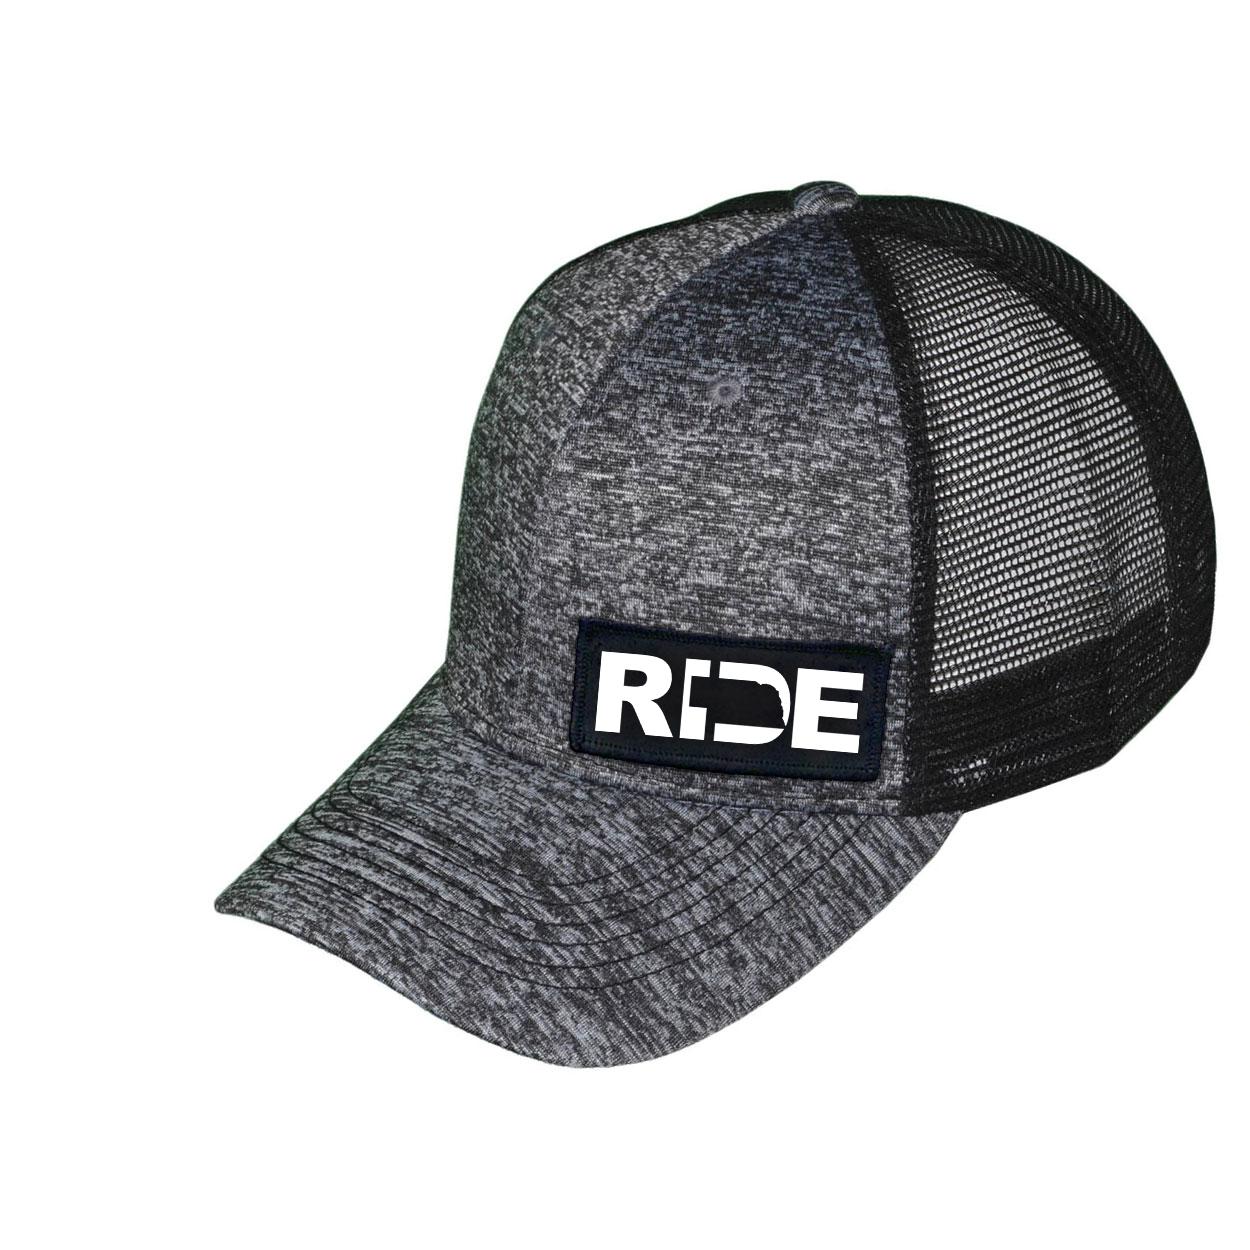 Ride Nebraska Night Out Woven Patch Melange Snapback Trucker Hat Gray/Black (White Logo)